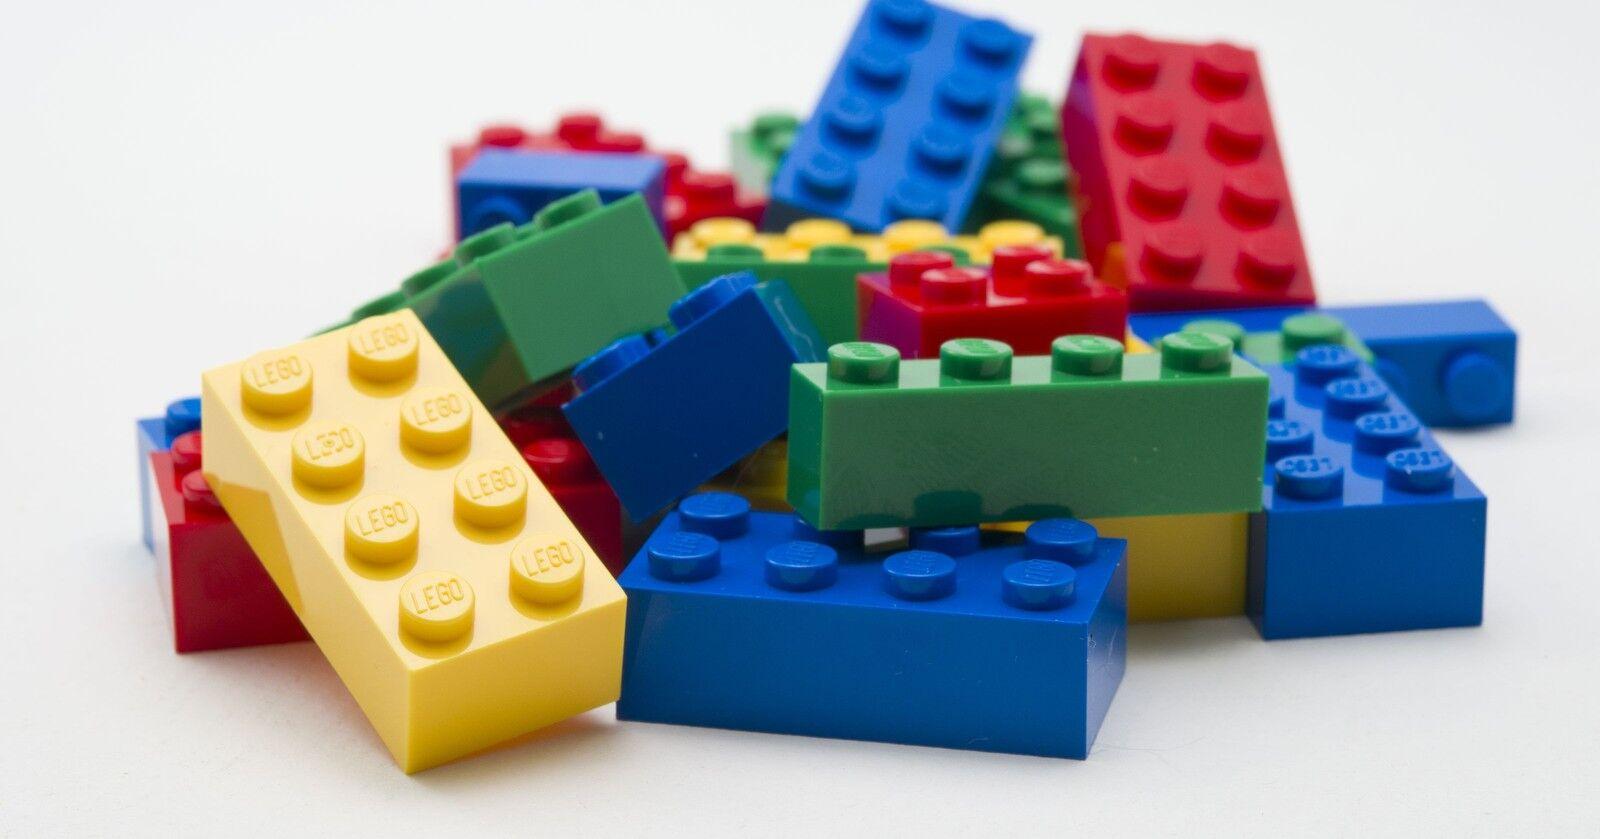 Legopalooza